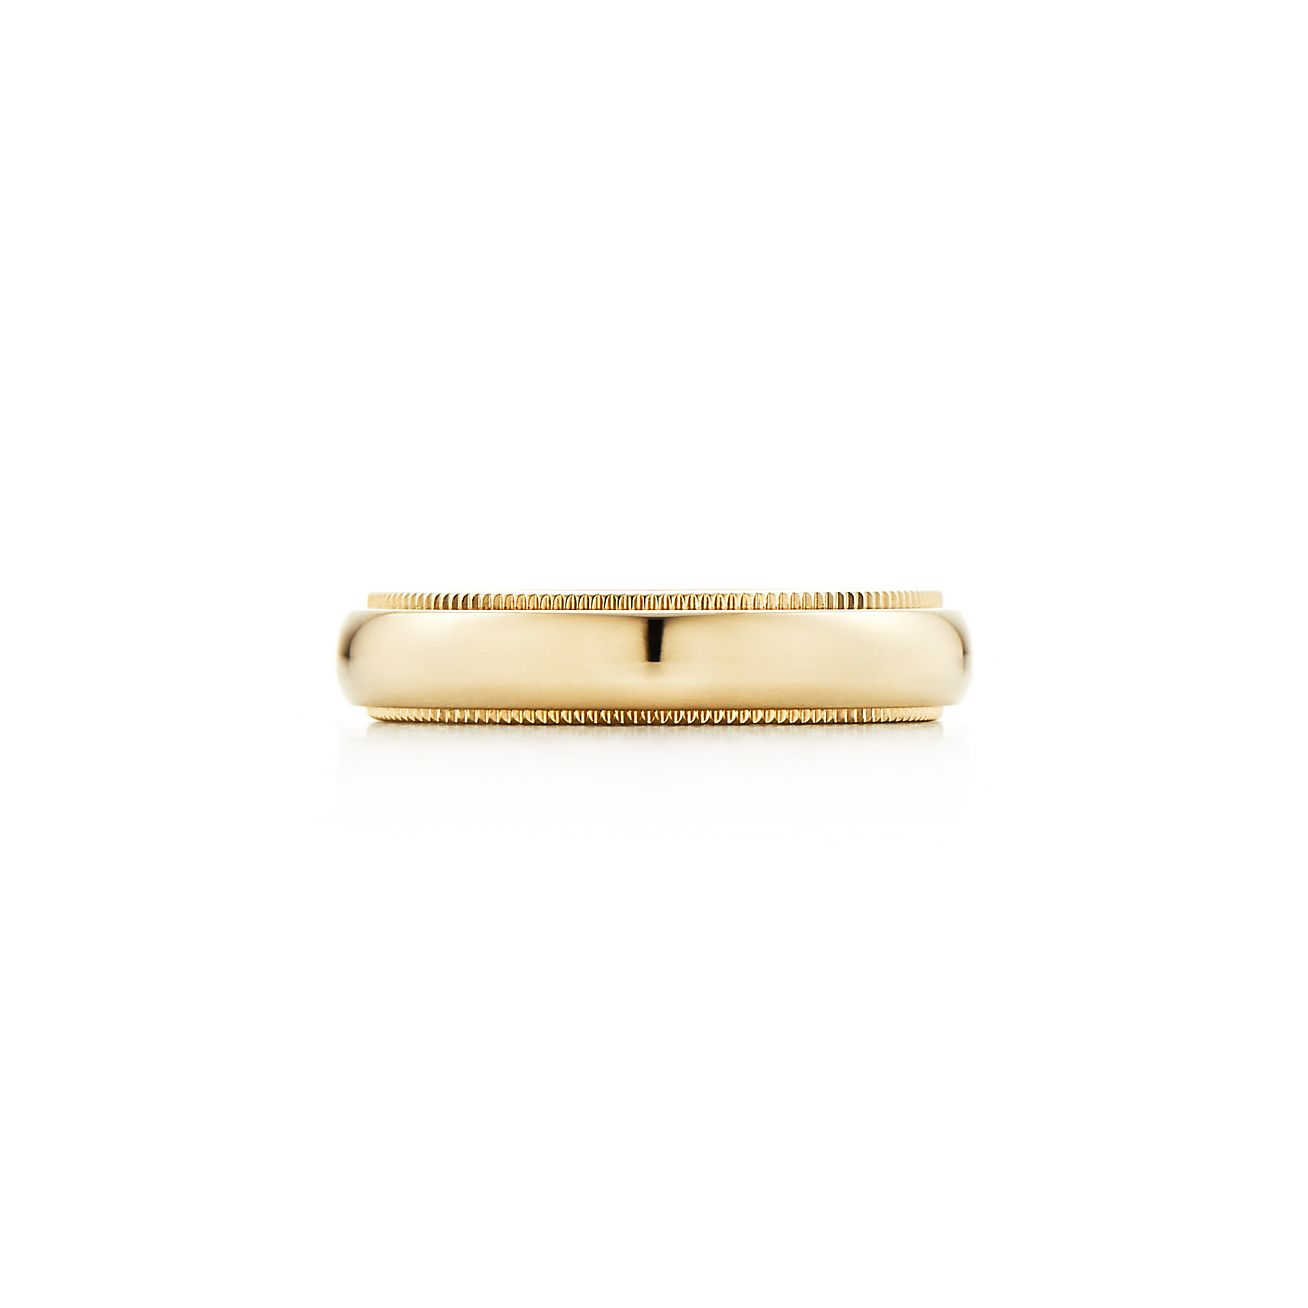 Tiffany Classic milgrain wedding band ring in 18k gold 4 mm wide